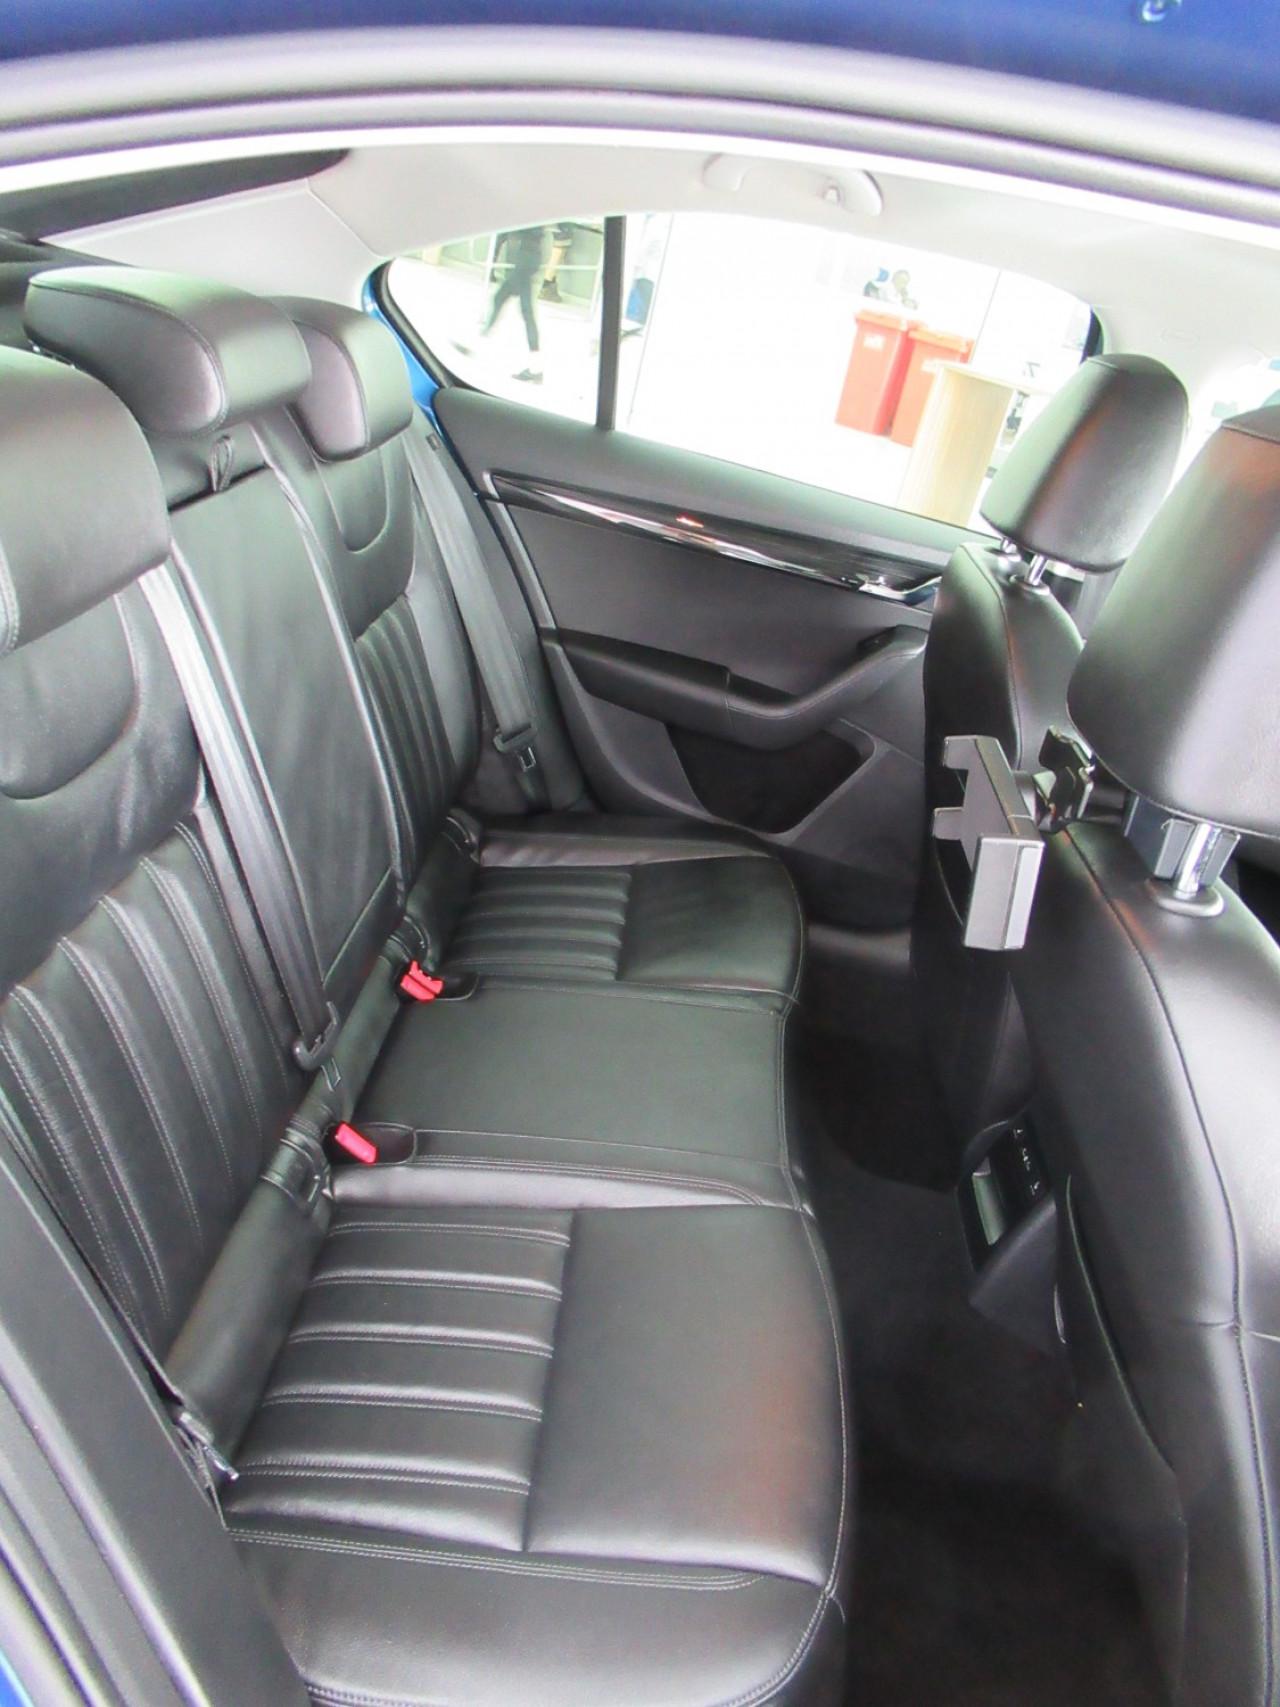 2017 MY18 Skoda Octavia NE MY18 110TSI Sedan Image 24